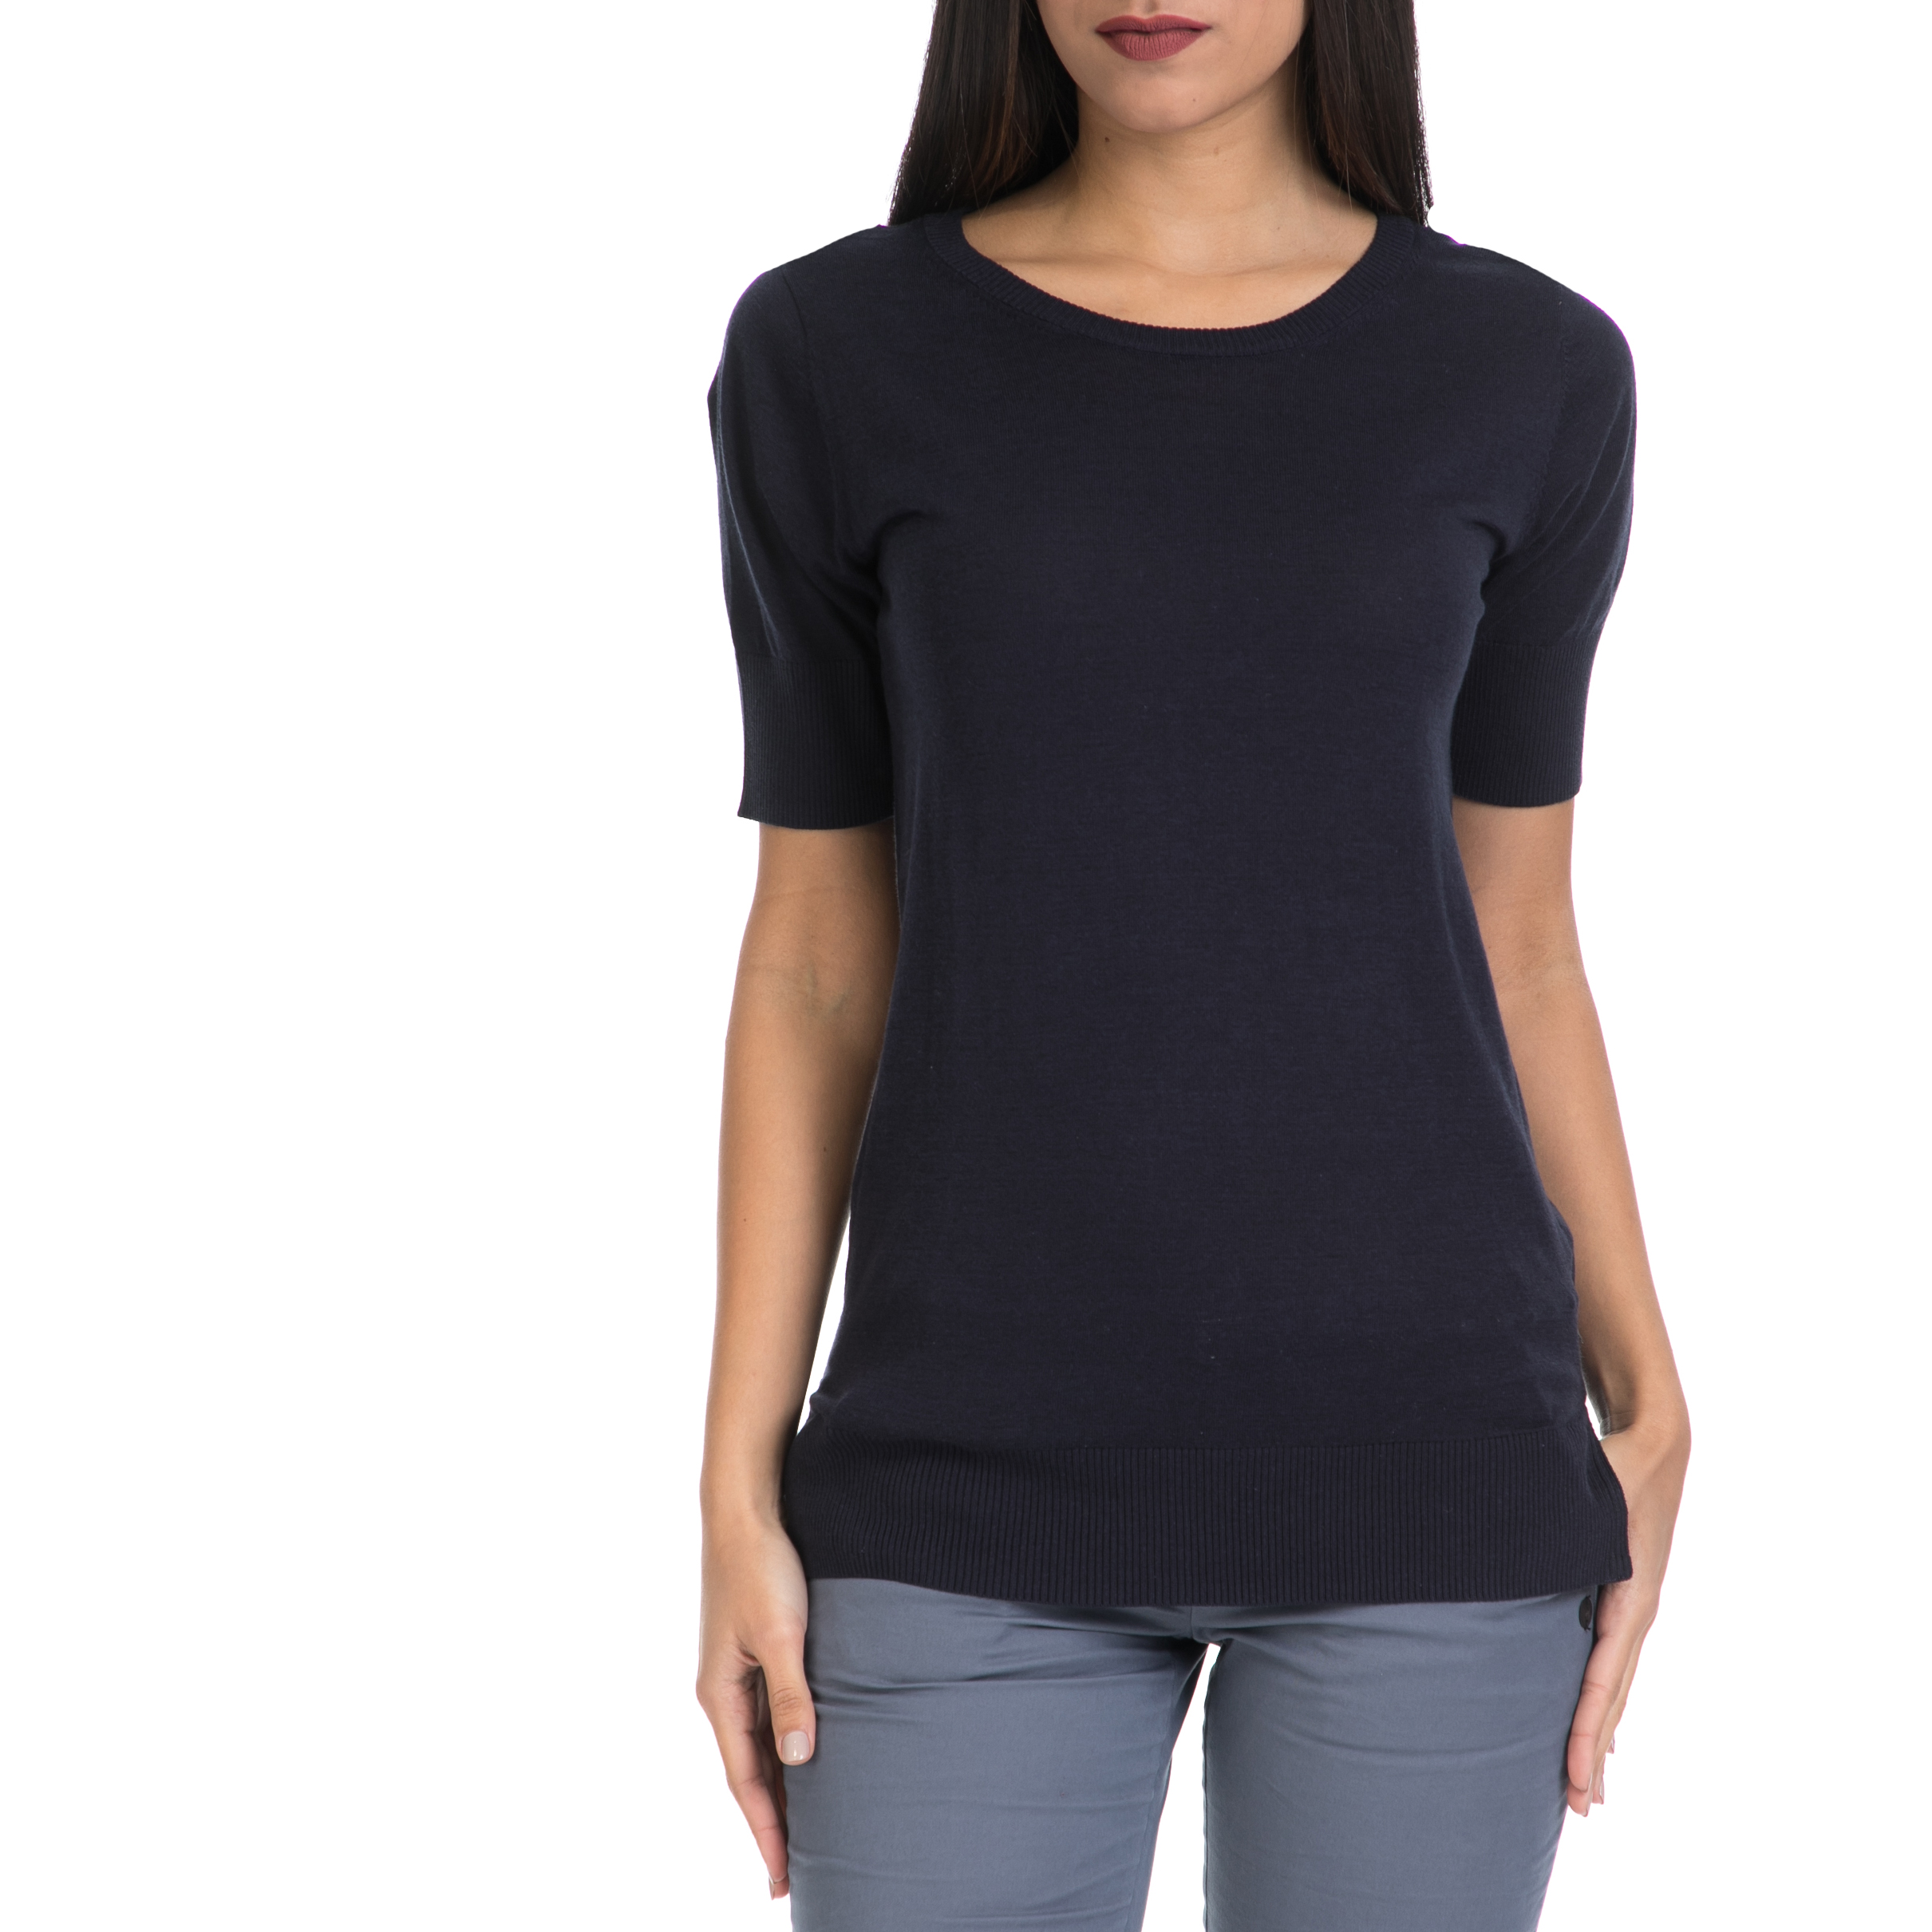 MAISON SCOTCH - Γυναικεία μπλούζα MAISON SCOTCH μπλε